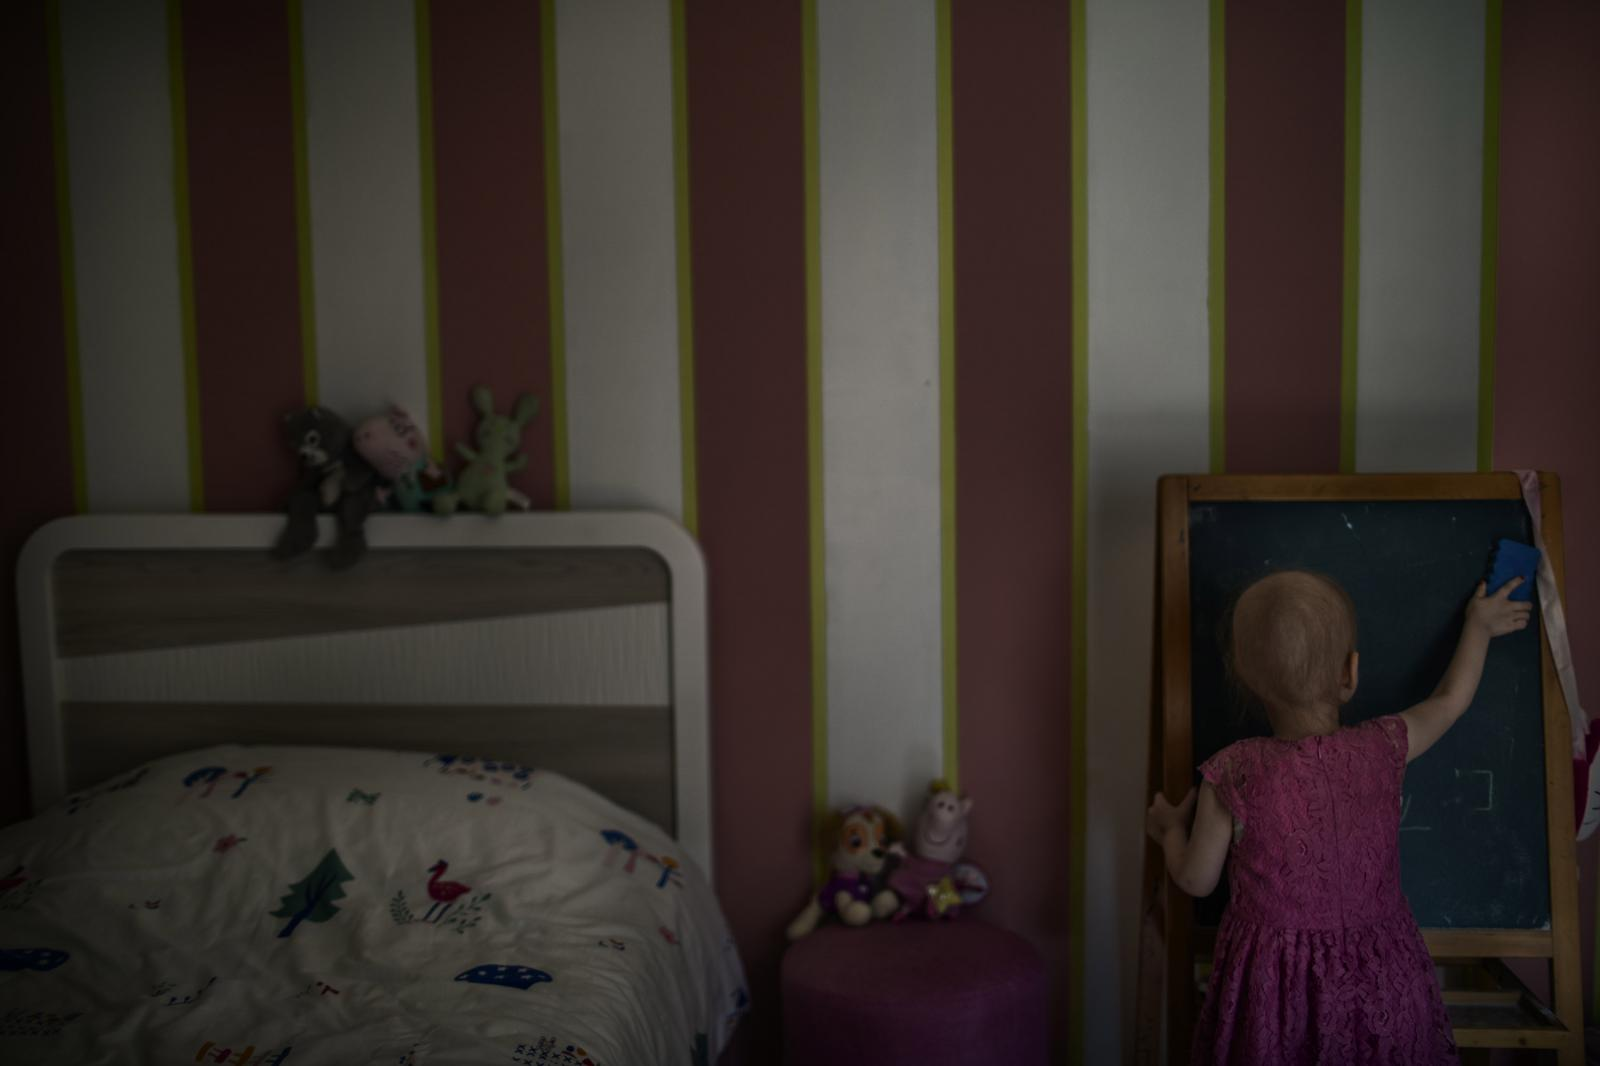 Photography image - Loading Cancer_Blast_LBN_DiegoIbarra_003.jpg